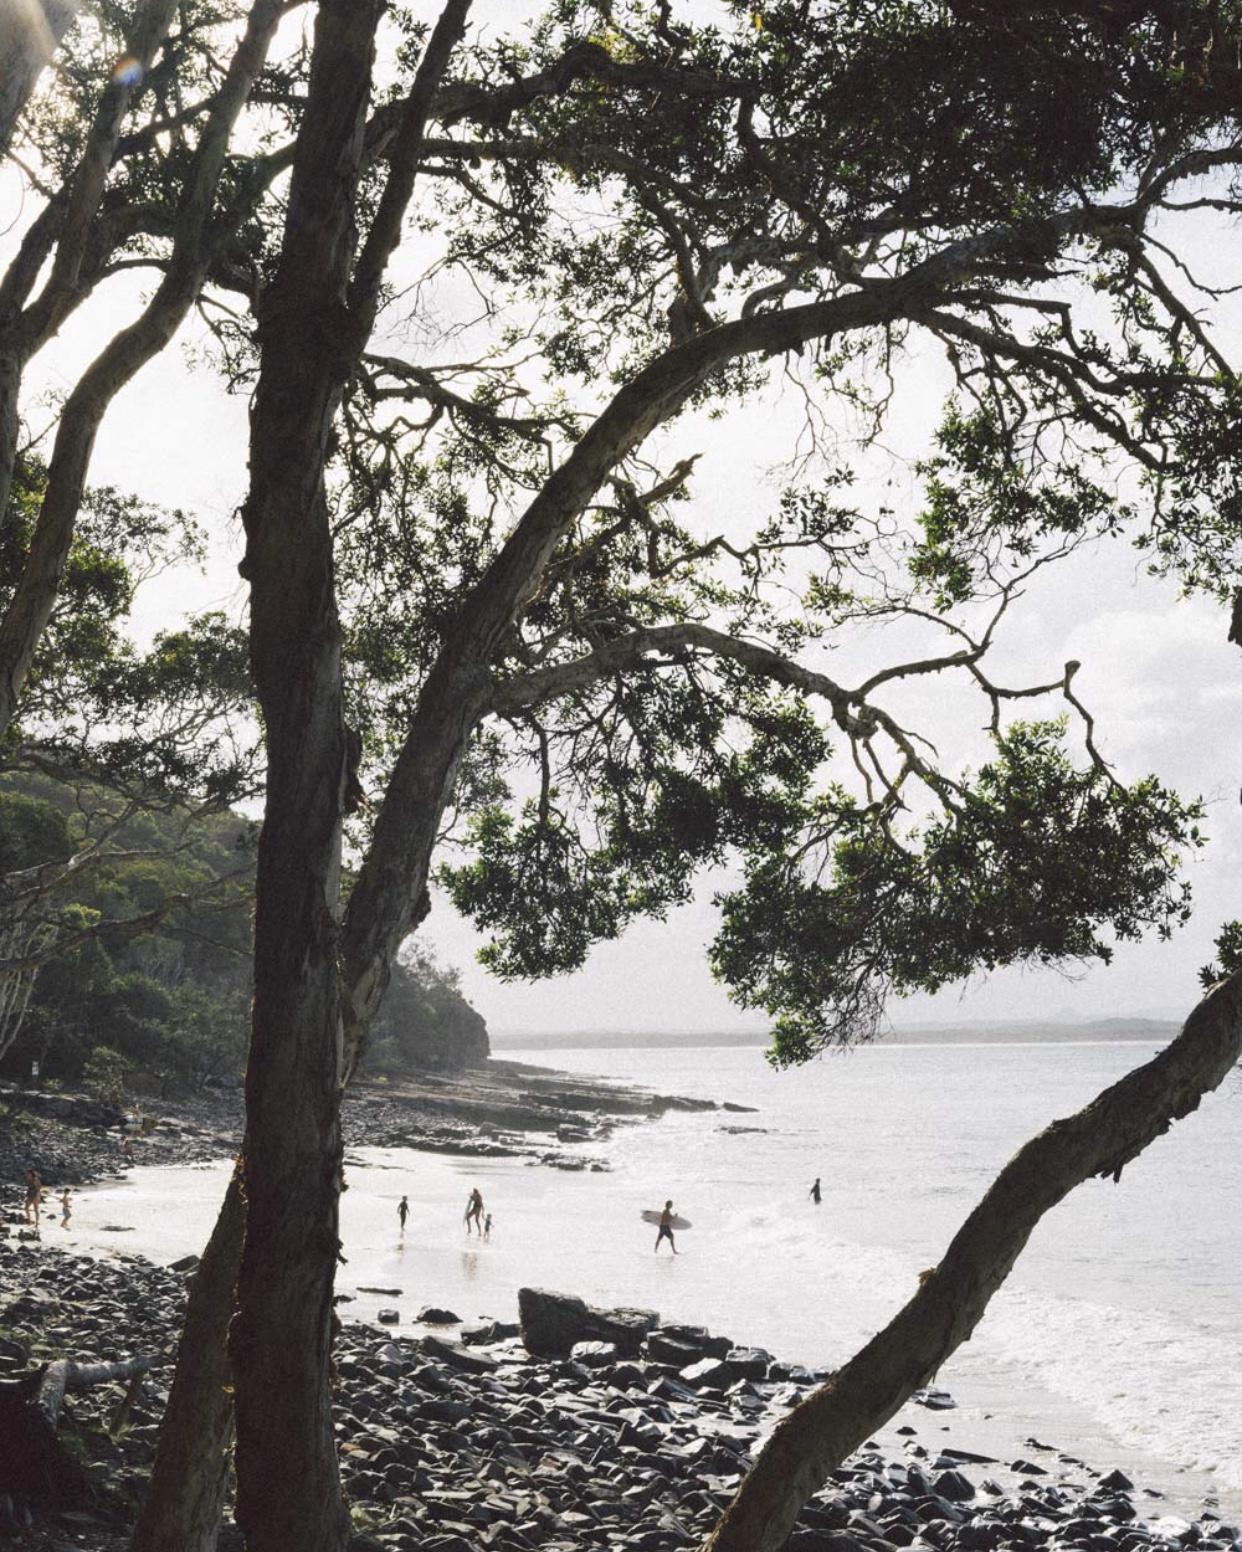 Tea Tree Bay, Noosa National Park  Image: @AimeeDodgePhotography